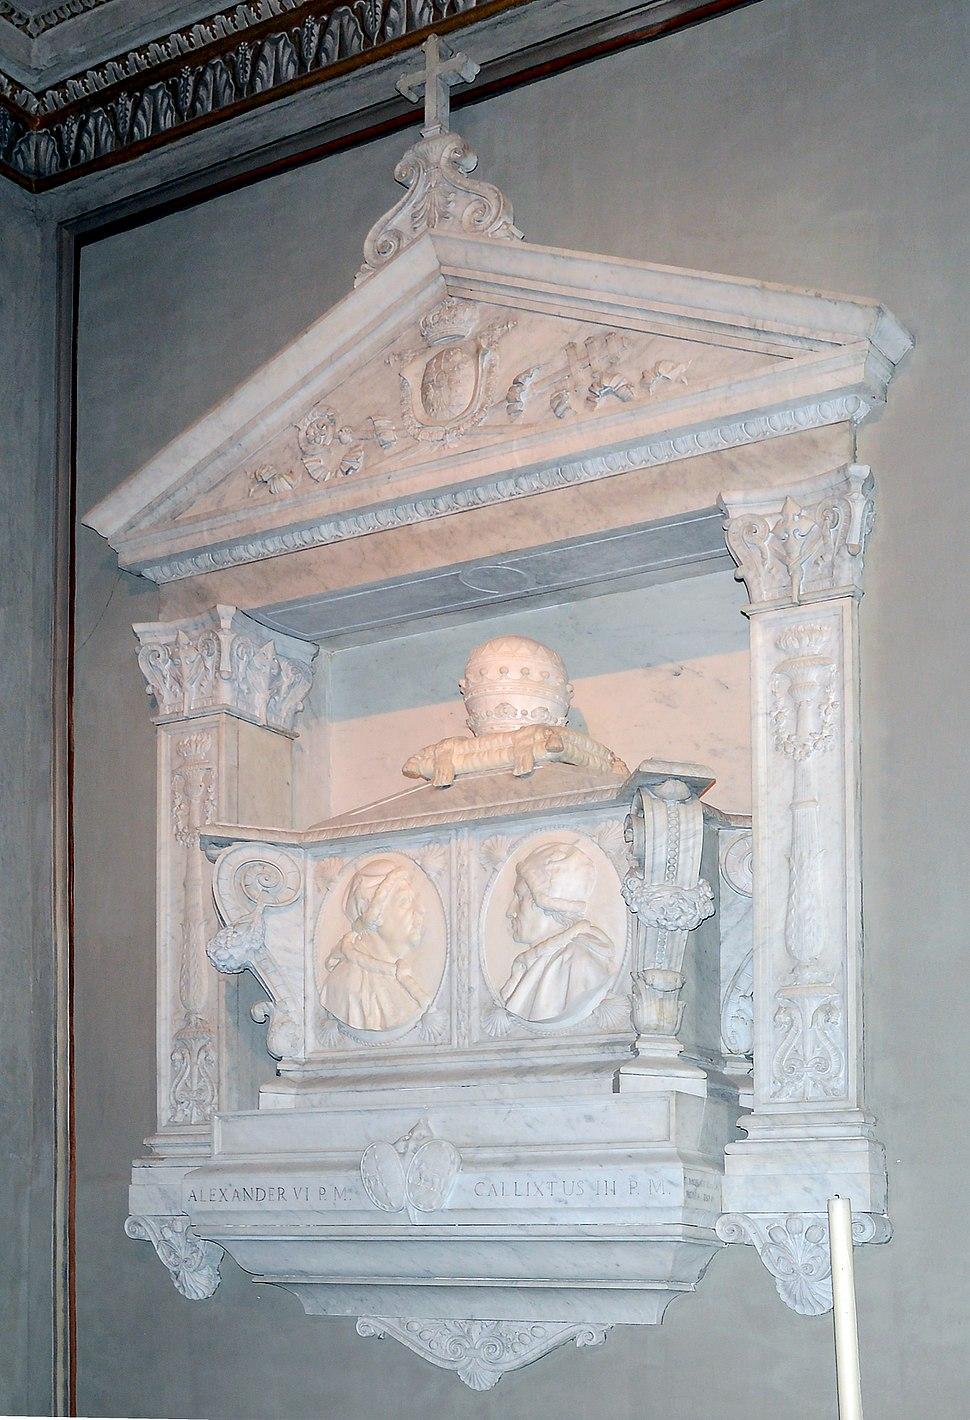 Tomb of Popes Borja ( Callisto III and Alessandro VI)